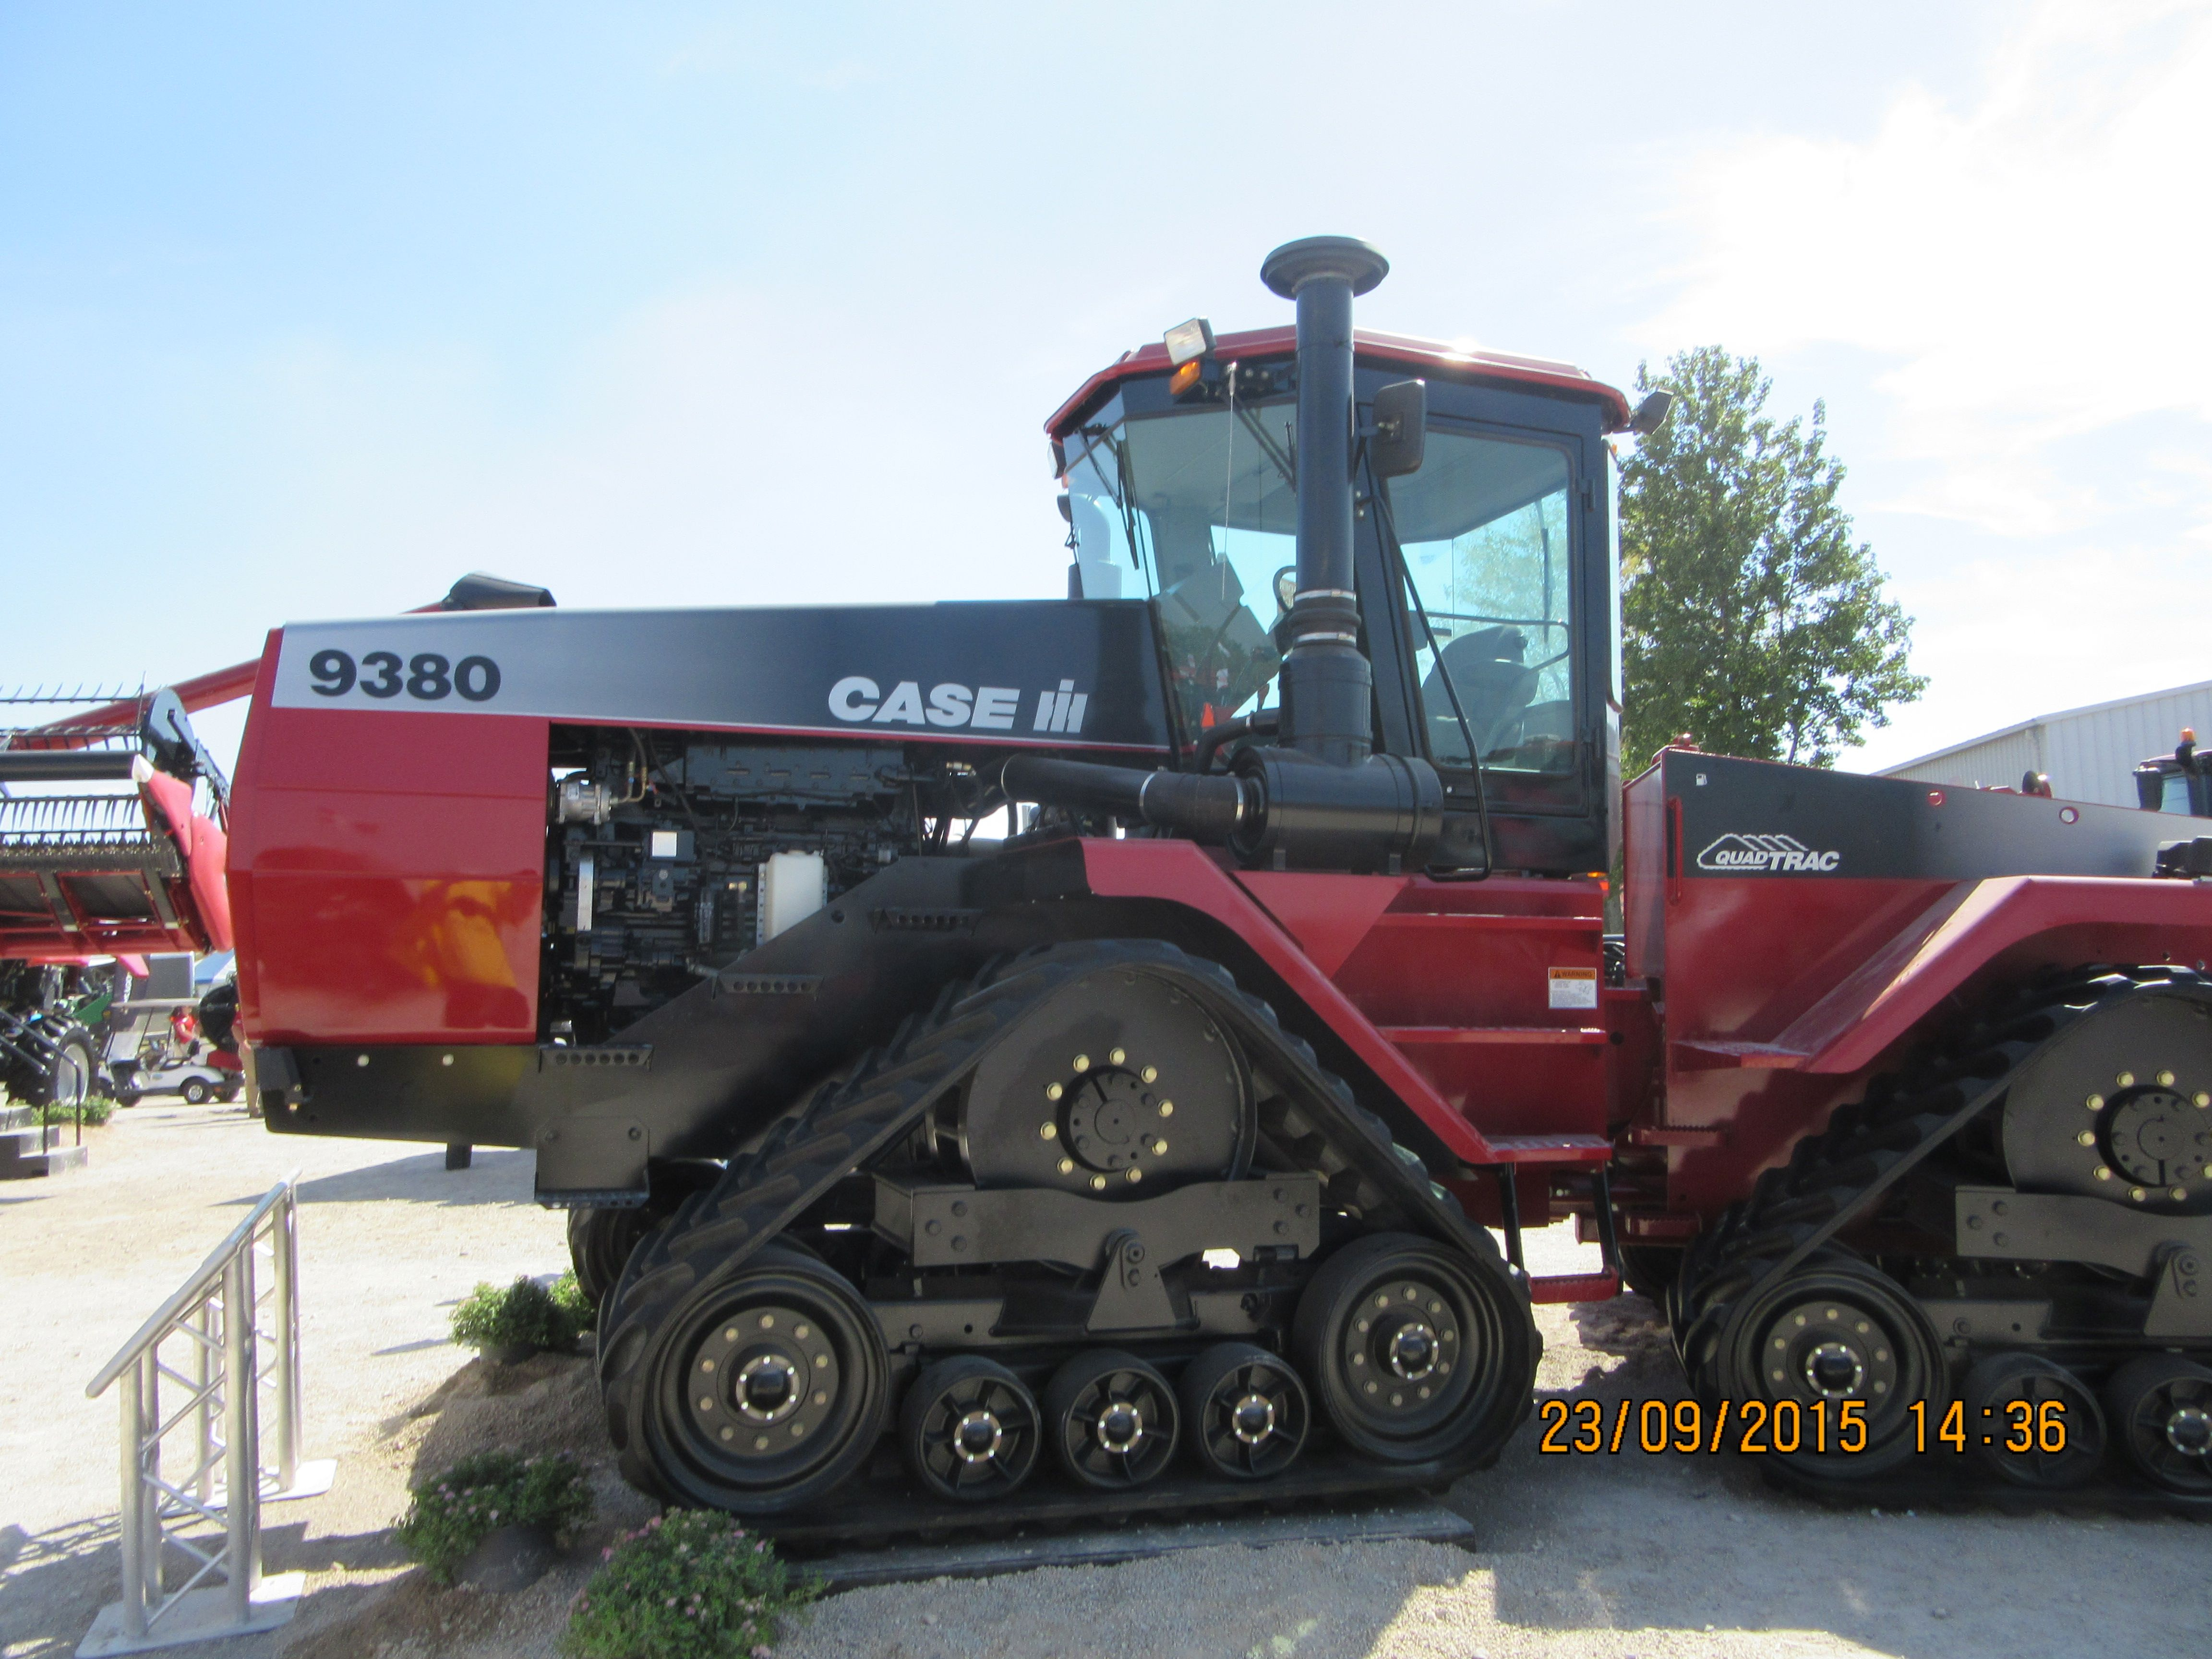 caseih steiger 9380 quadtrac case ih tractors big tractors international harvester down on [ 4608 x 3456 Pixel ]